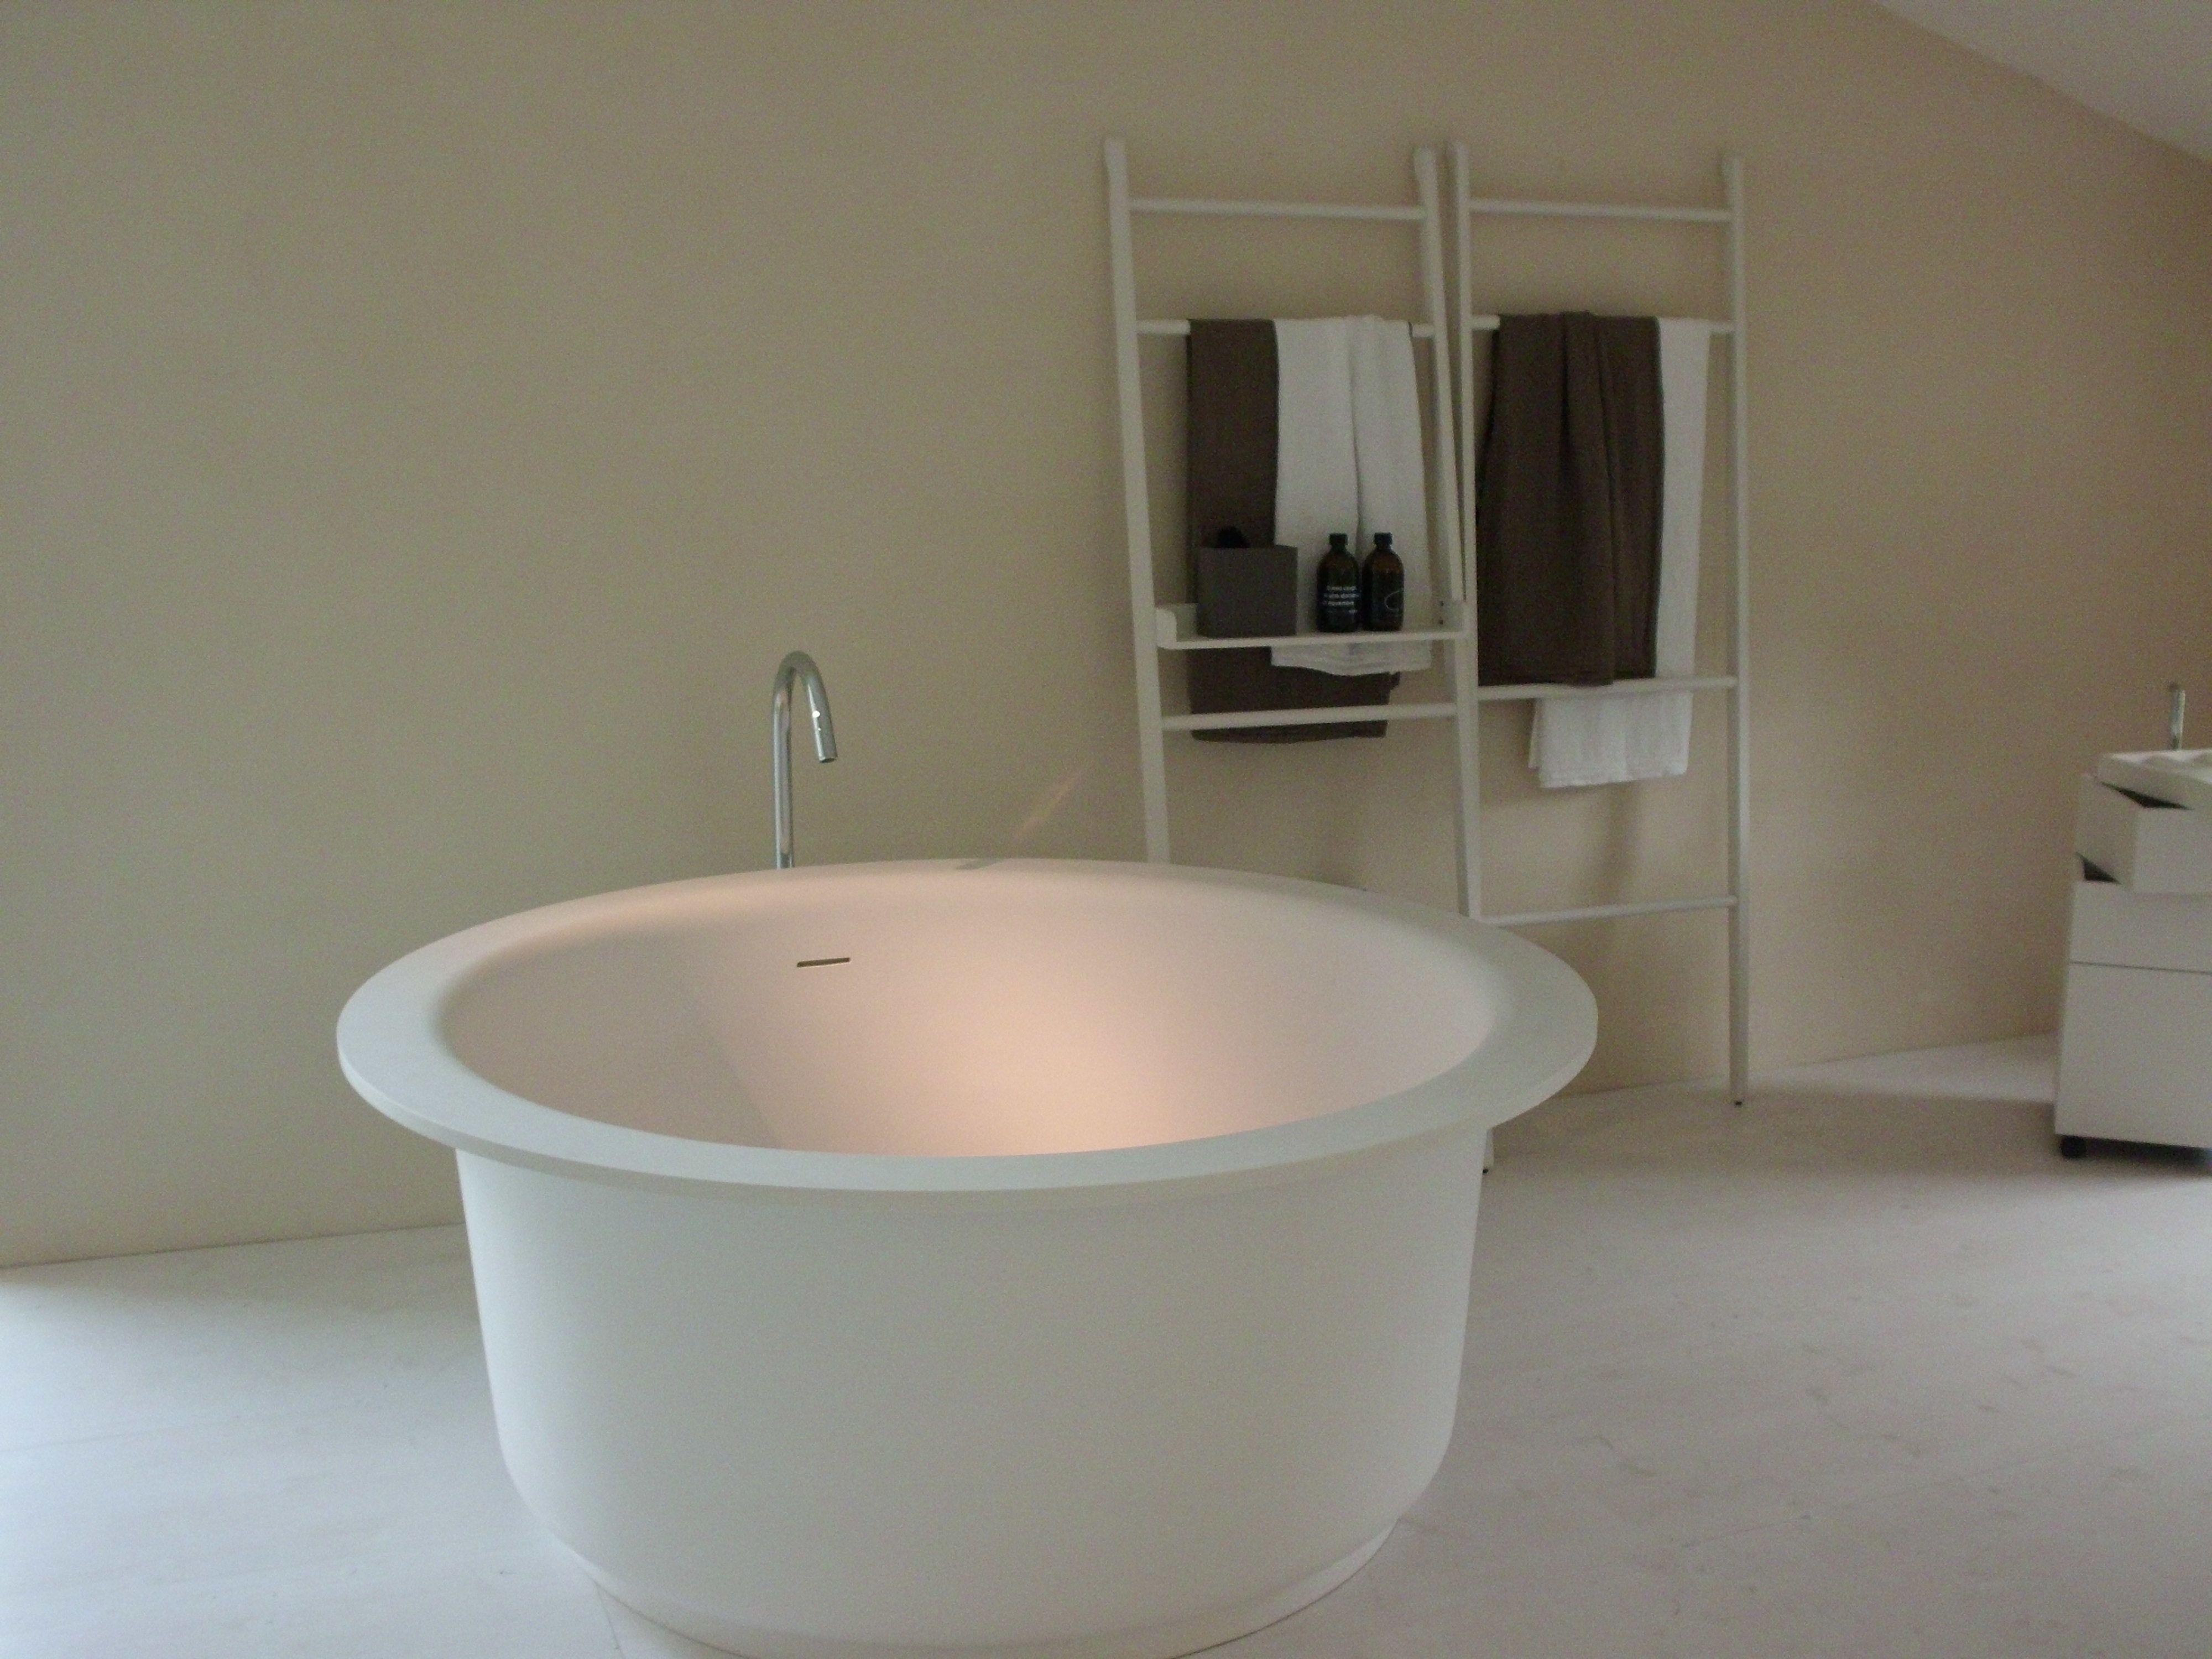 Mülleimer Badezimmer ~ 54 best agape bad design images on pinterest sink tops bathroom